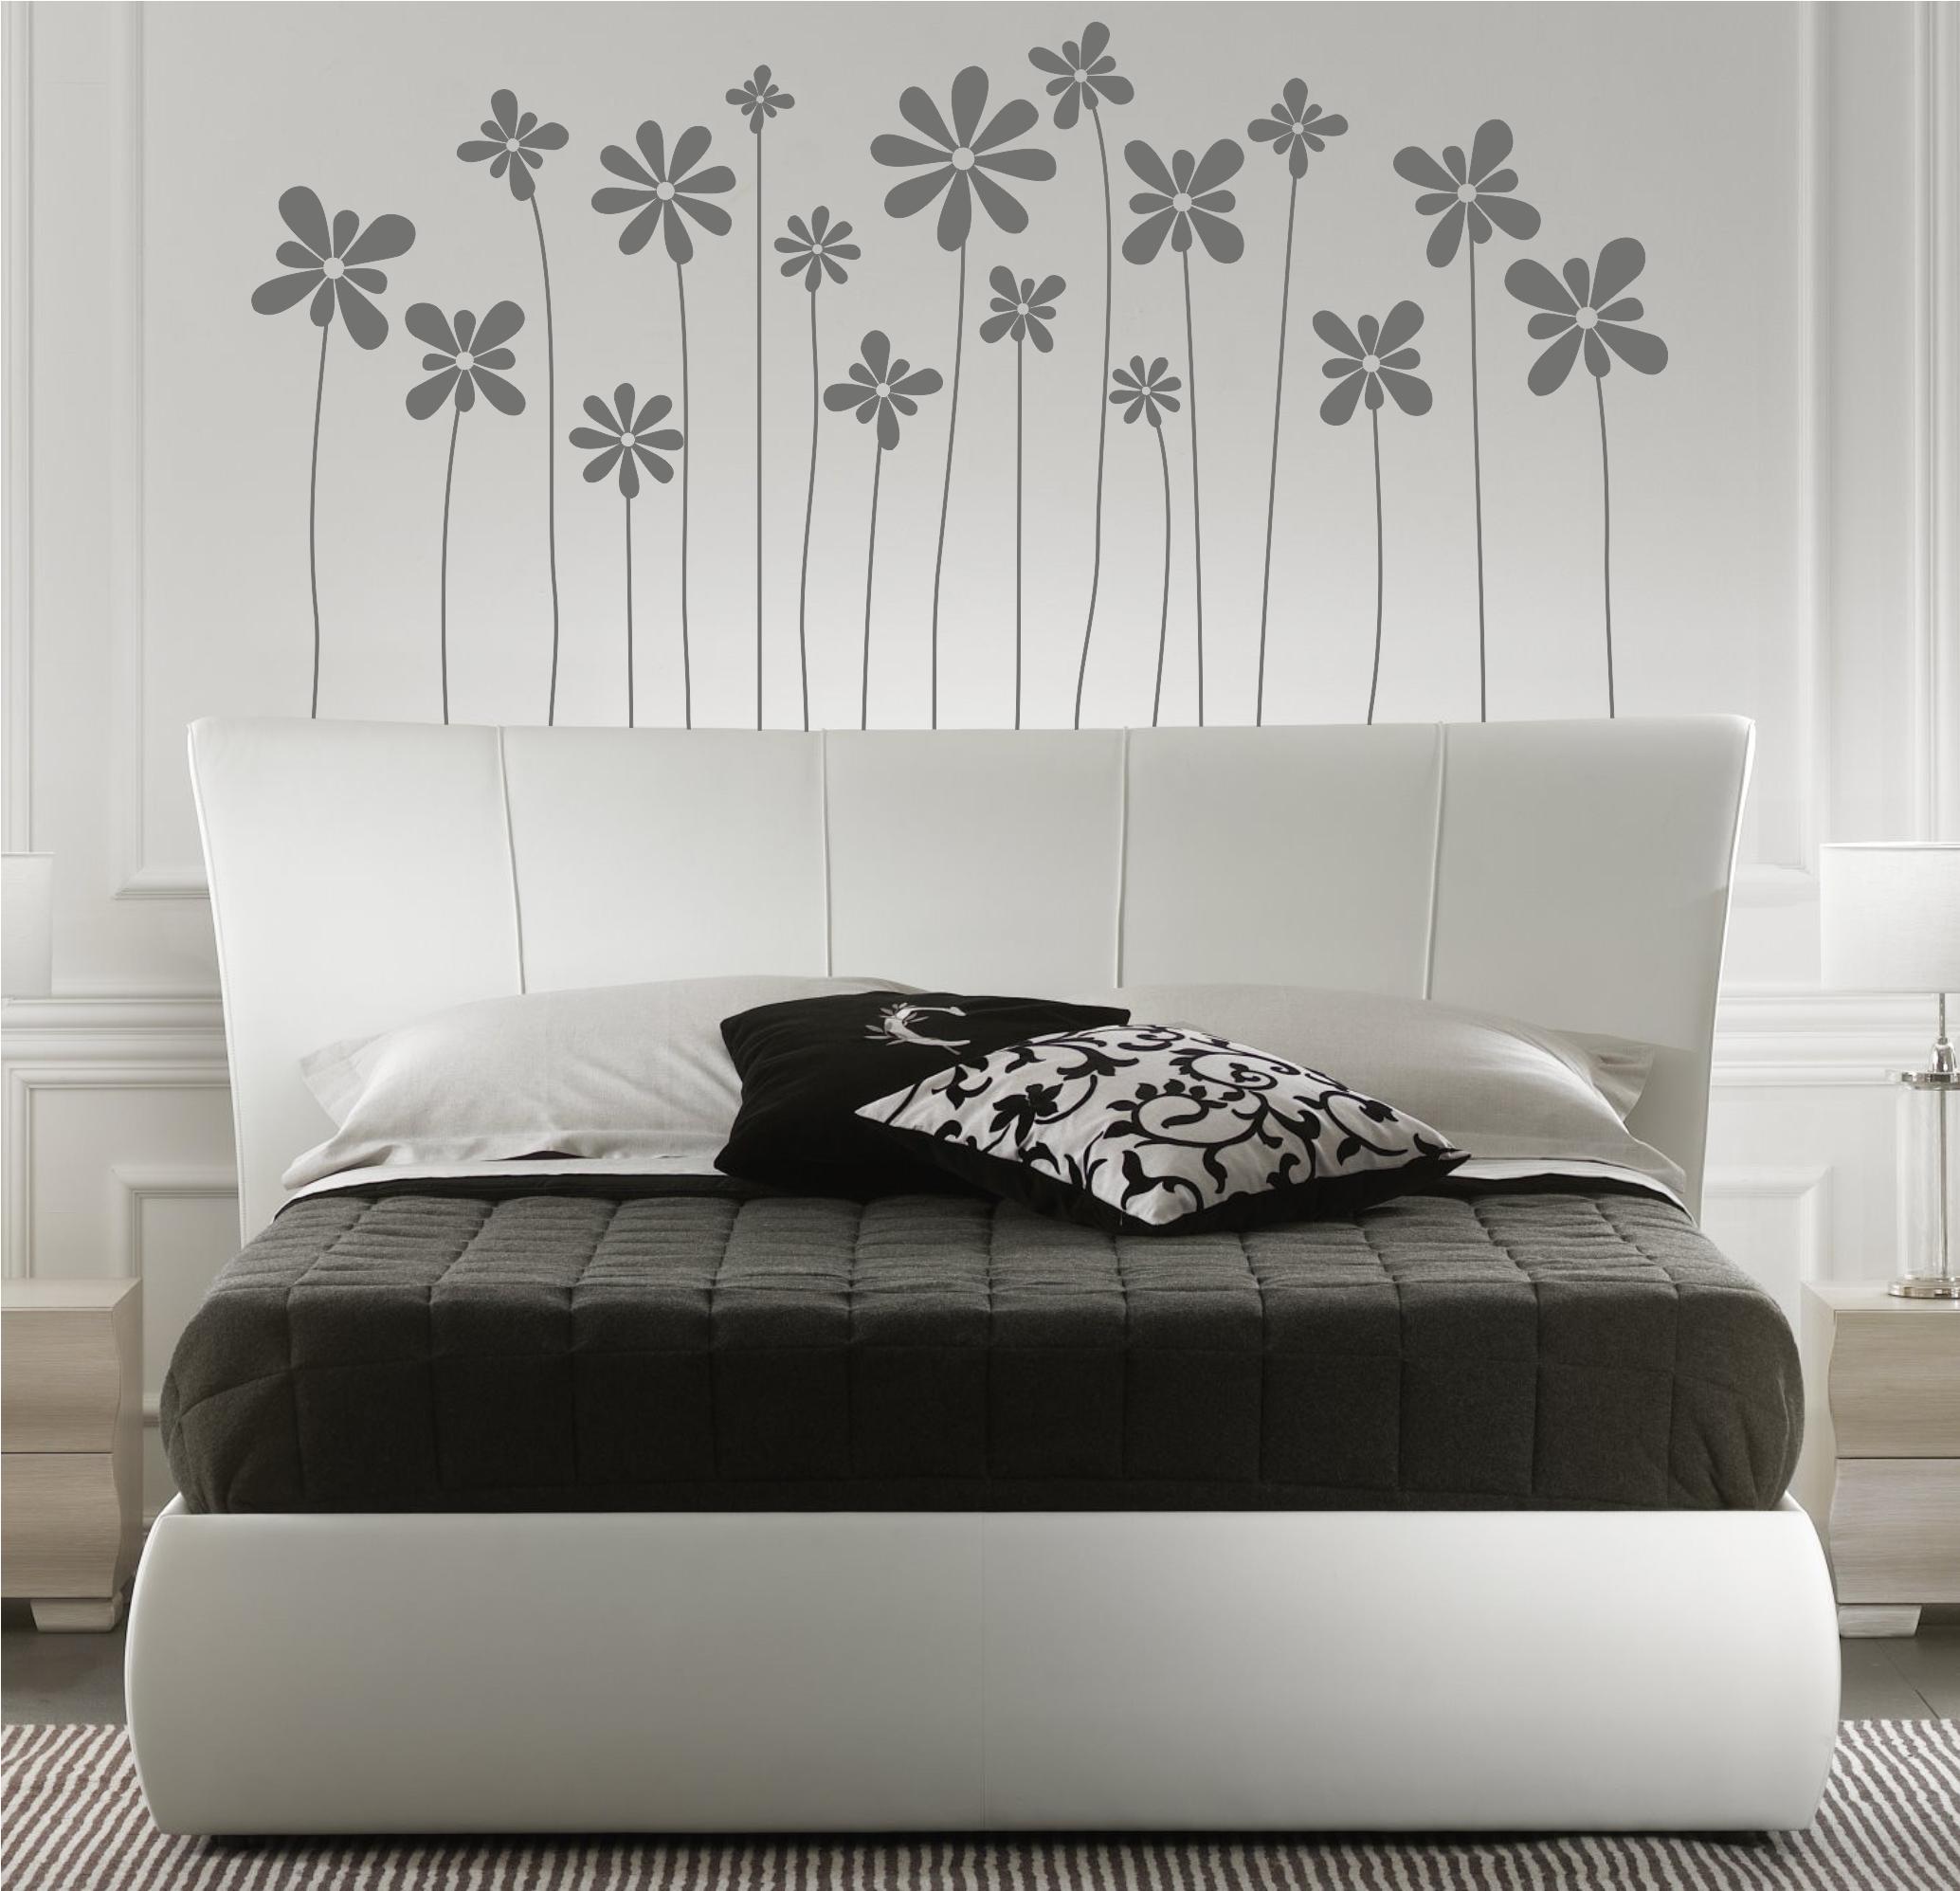 Vinilo decorativo de un cabecero de cama motivo floral 5 for Vinilos cabeceros